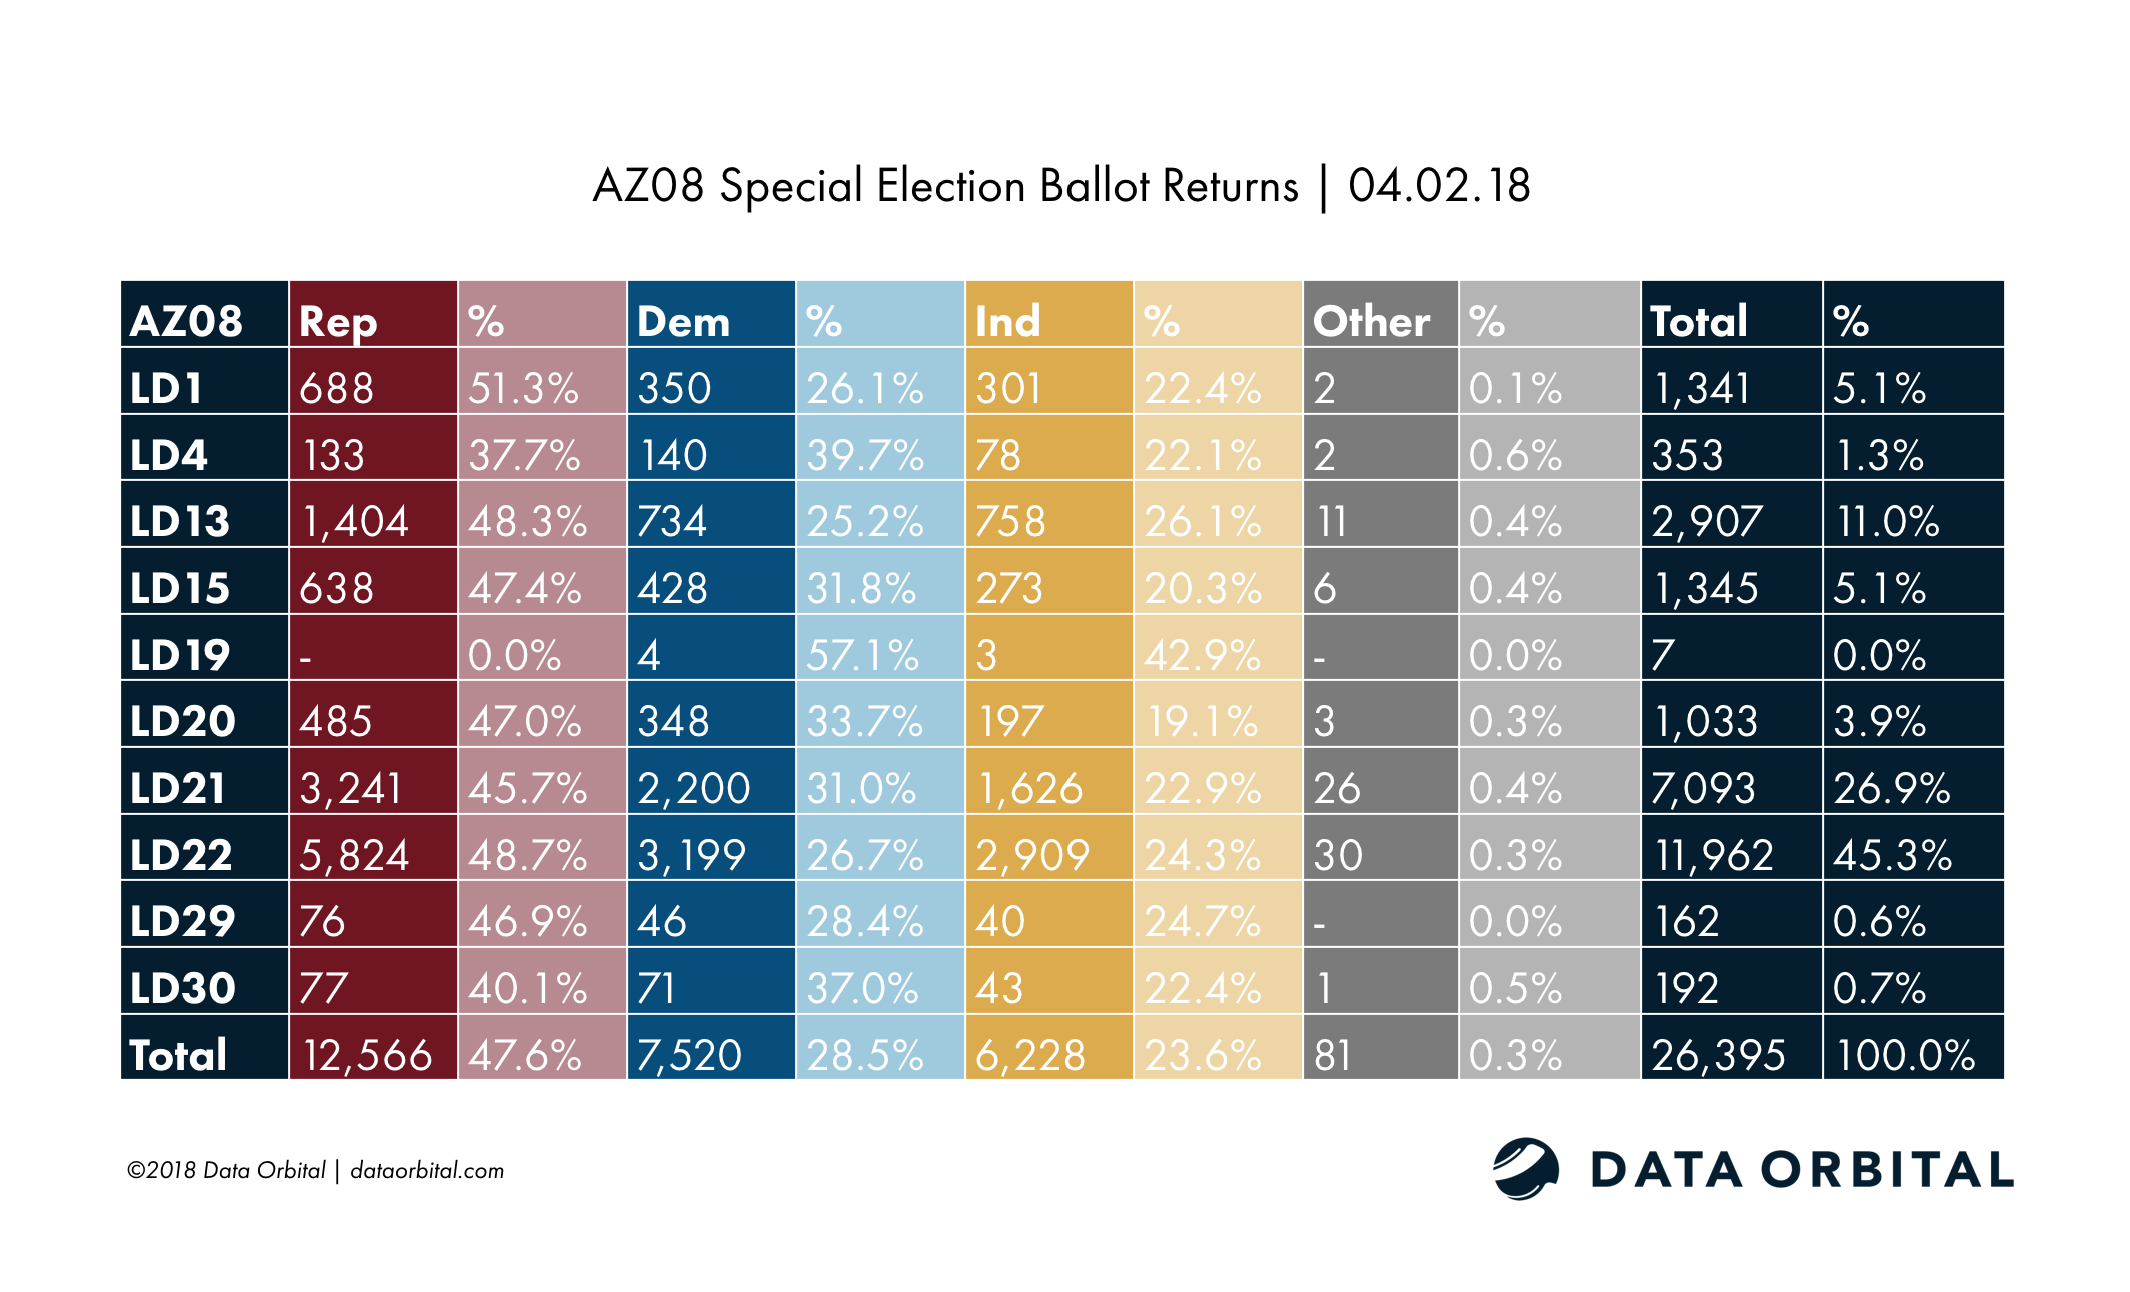 AZ08 Special Election Ballot Returns 04.02.18